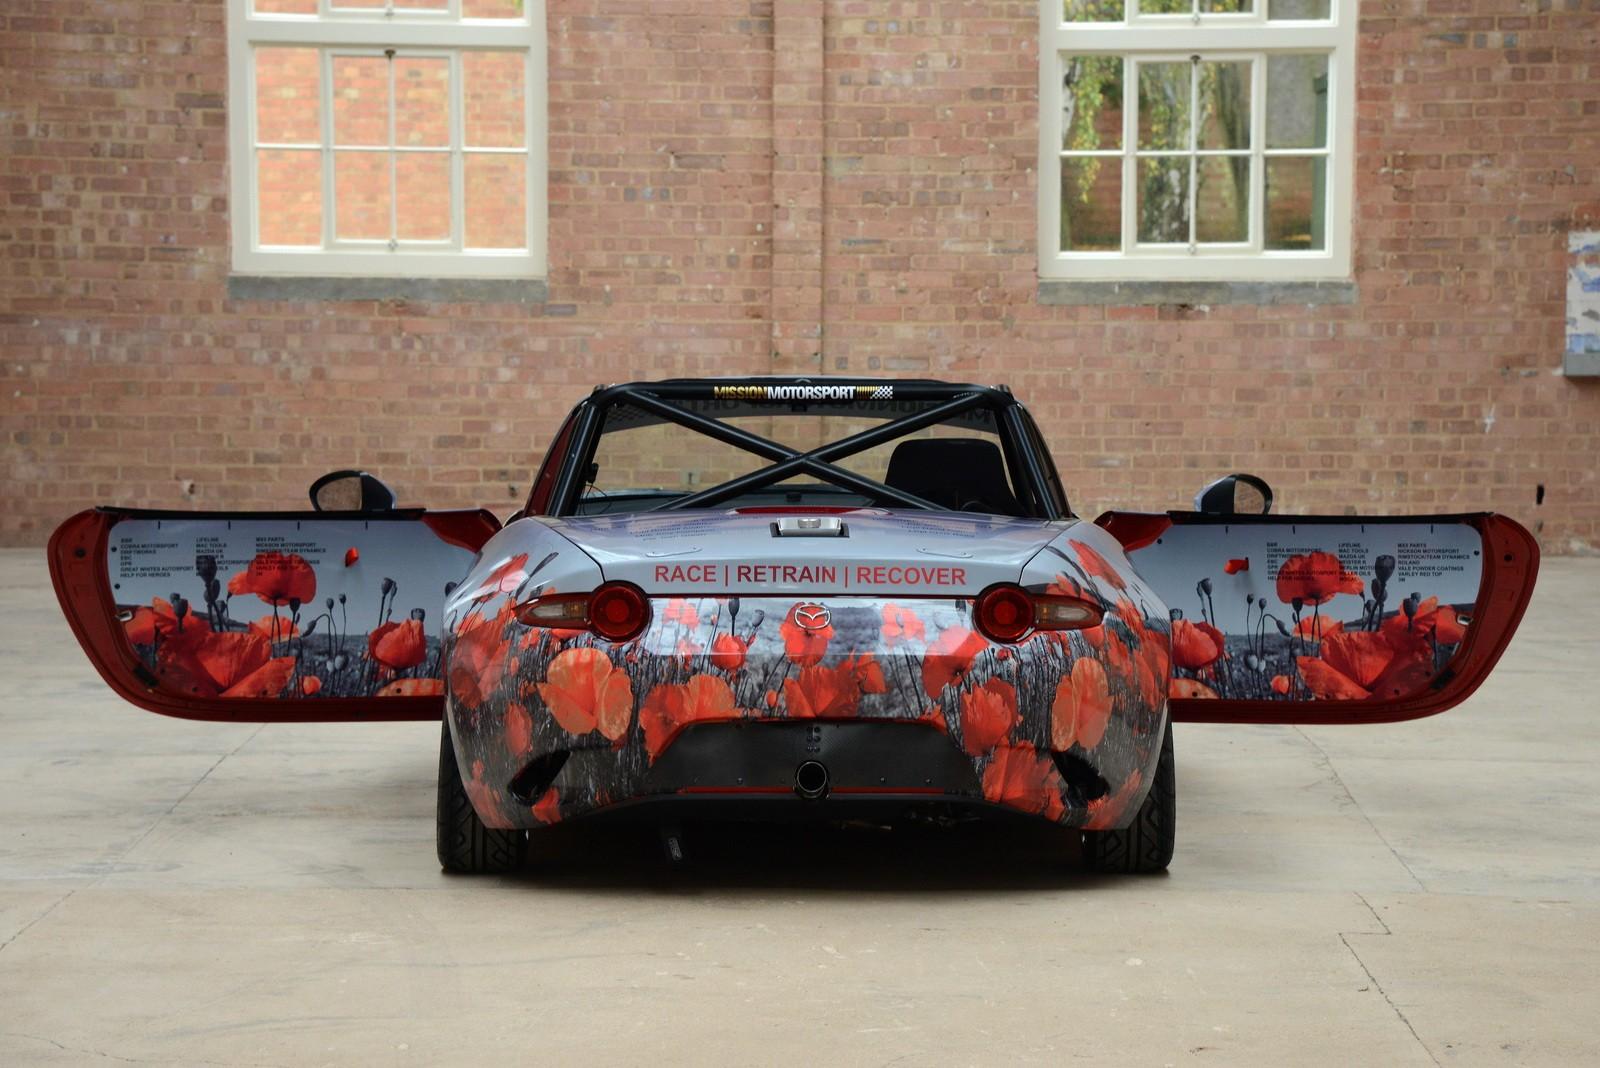 Miata with poppy art car livery isn t just for show autoevolution - Filename 2016 Mazda Mx 5 Miata With Poppy Art Car Livery Isn T Just For Show Photo Gallery_7 Jpg